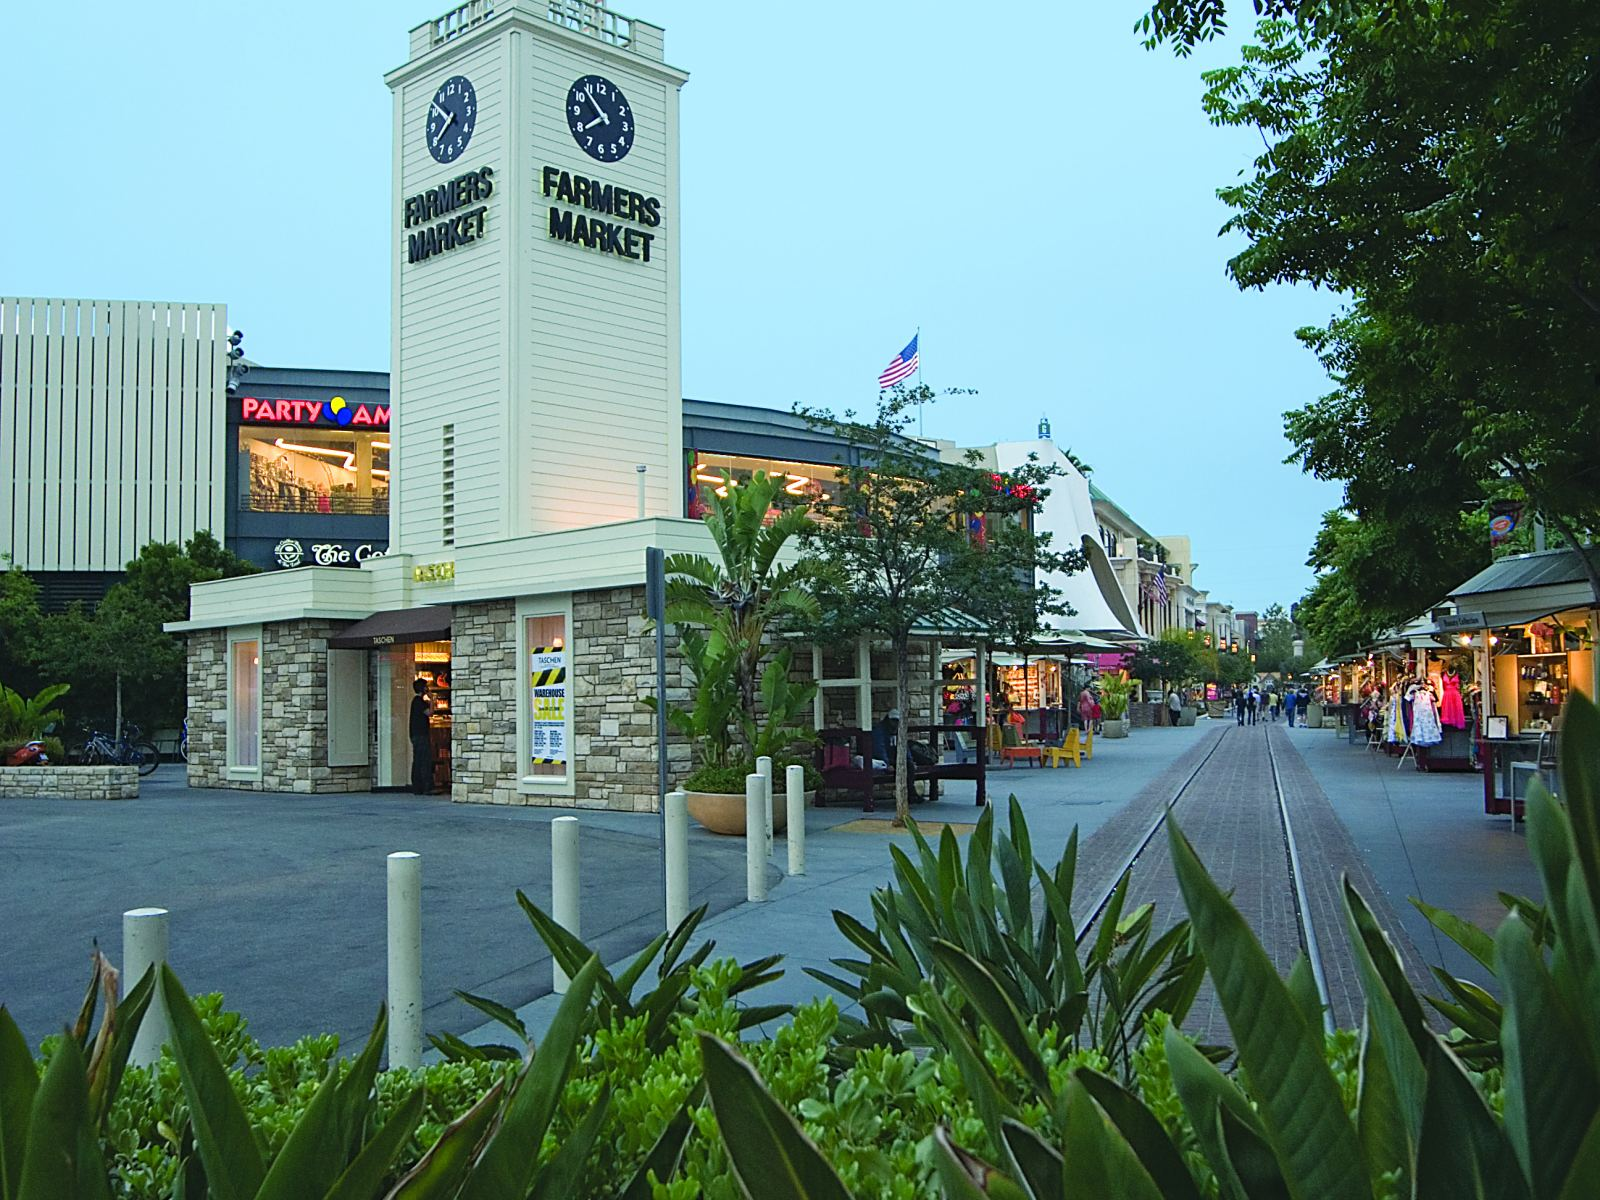 Main image for article titled Compras em Los Angeles: The Original Farmers Market